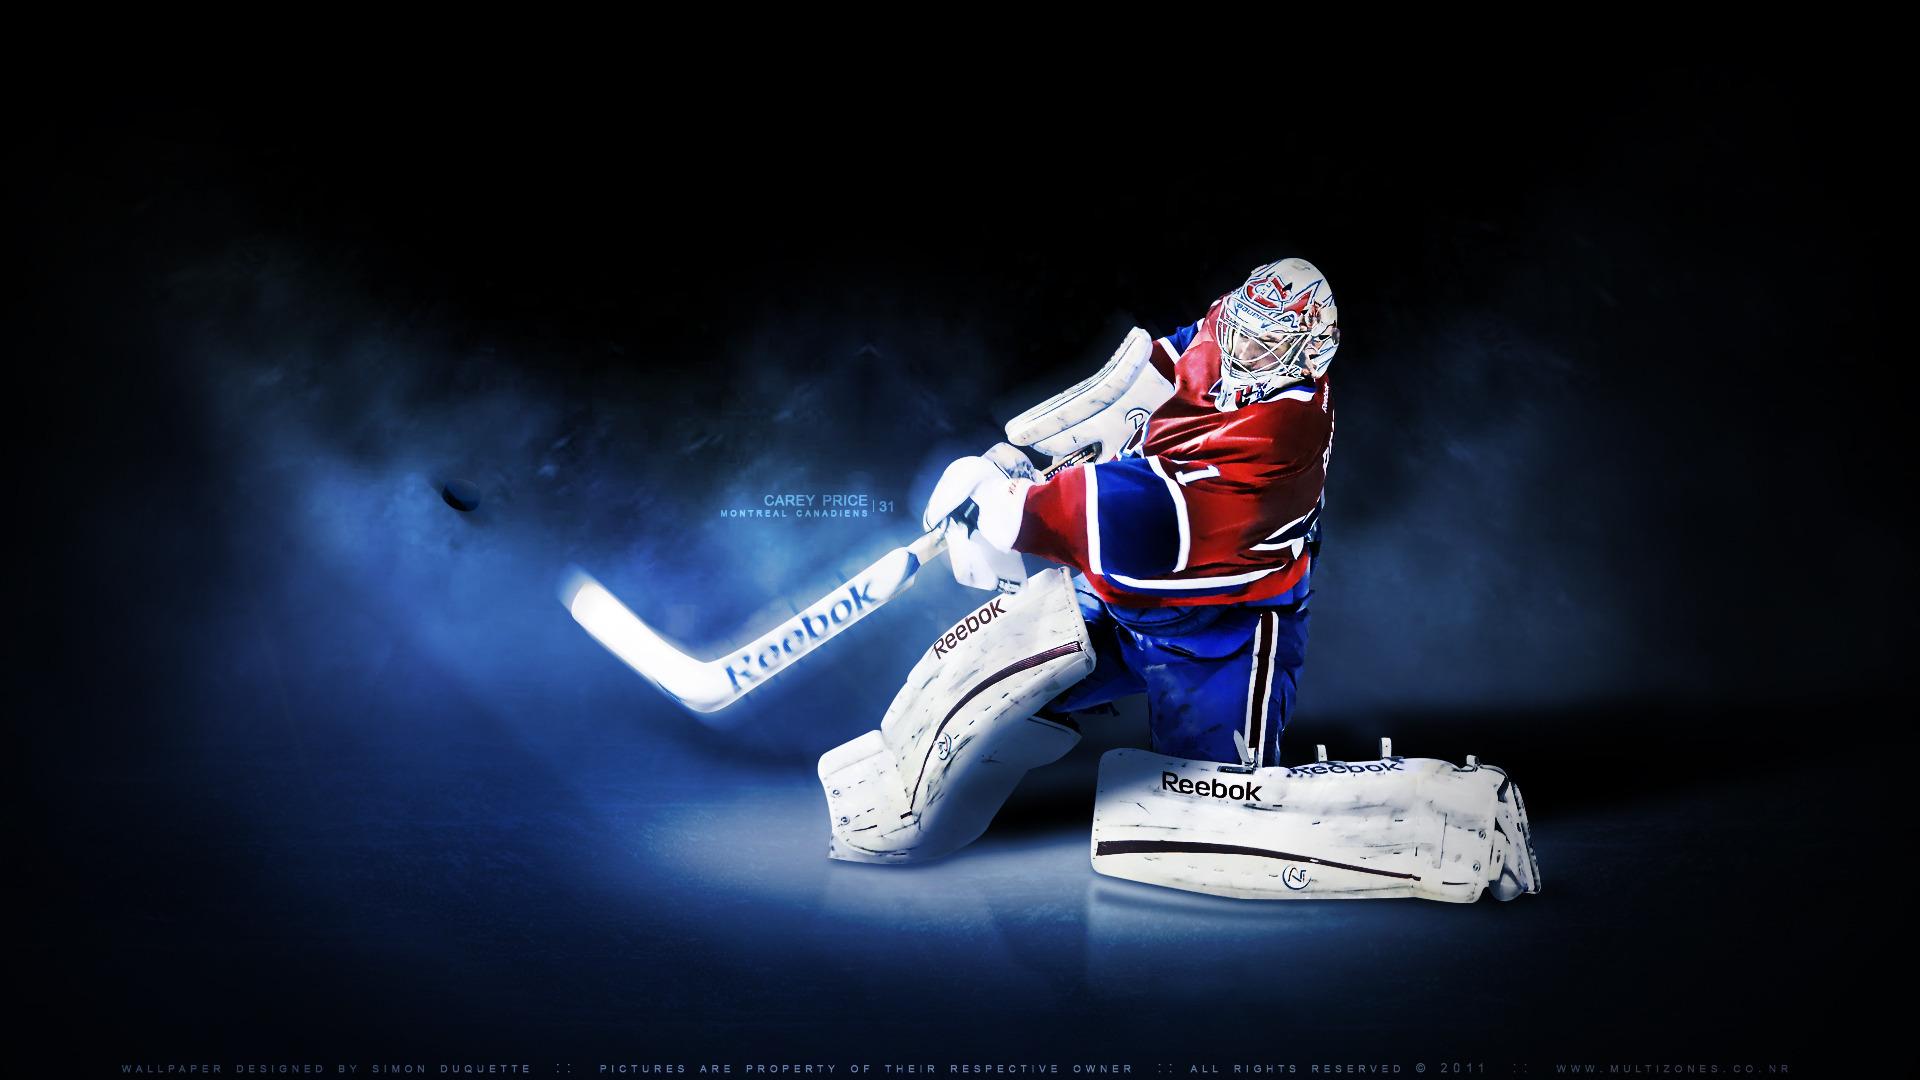 Carey Price Montreal Canadiens Wallpaper 1920x1080